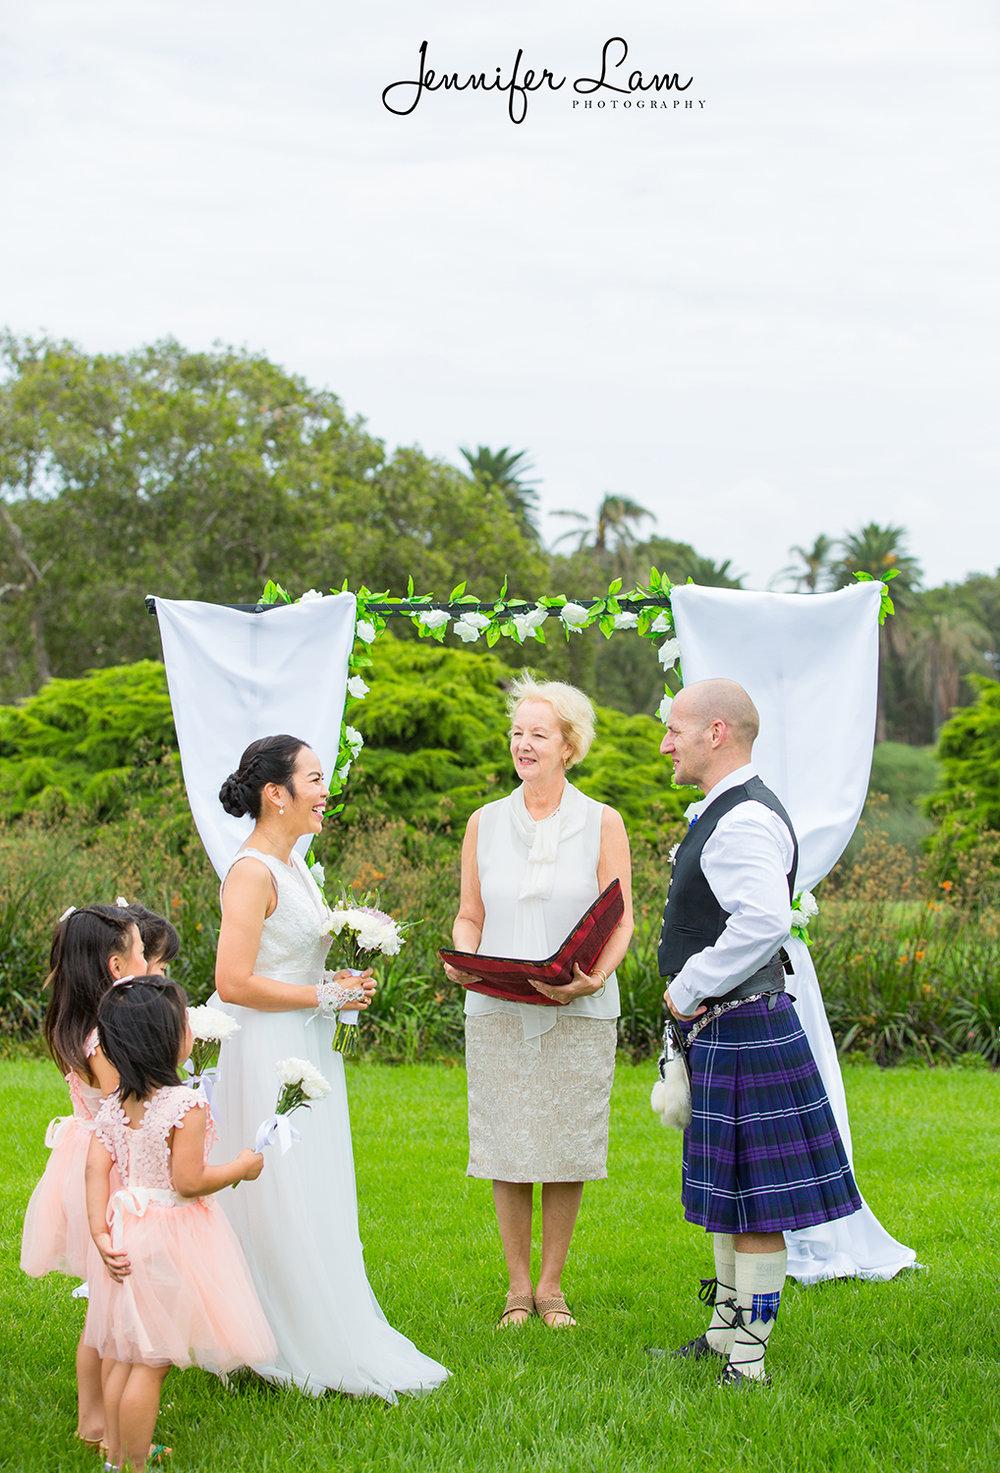 Sydney Wedding Photographer - Jennifer Lam Photography (34).jpg